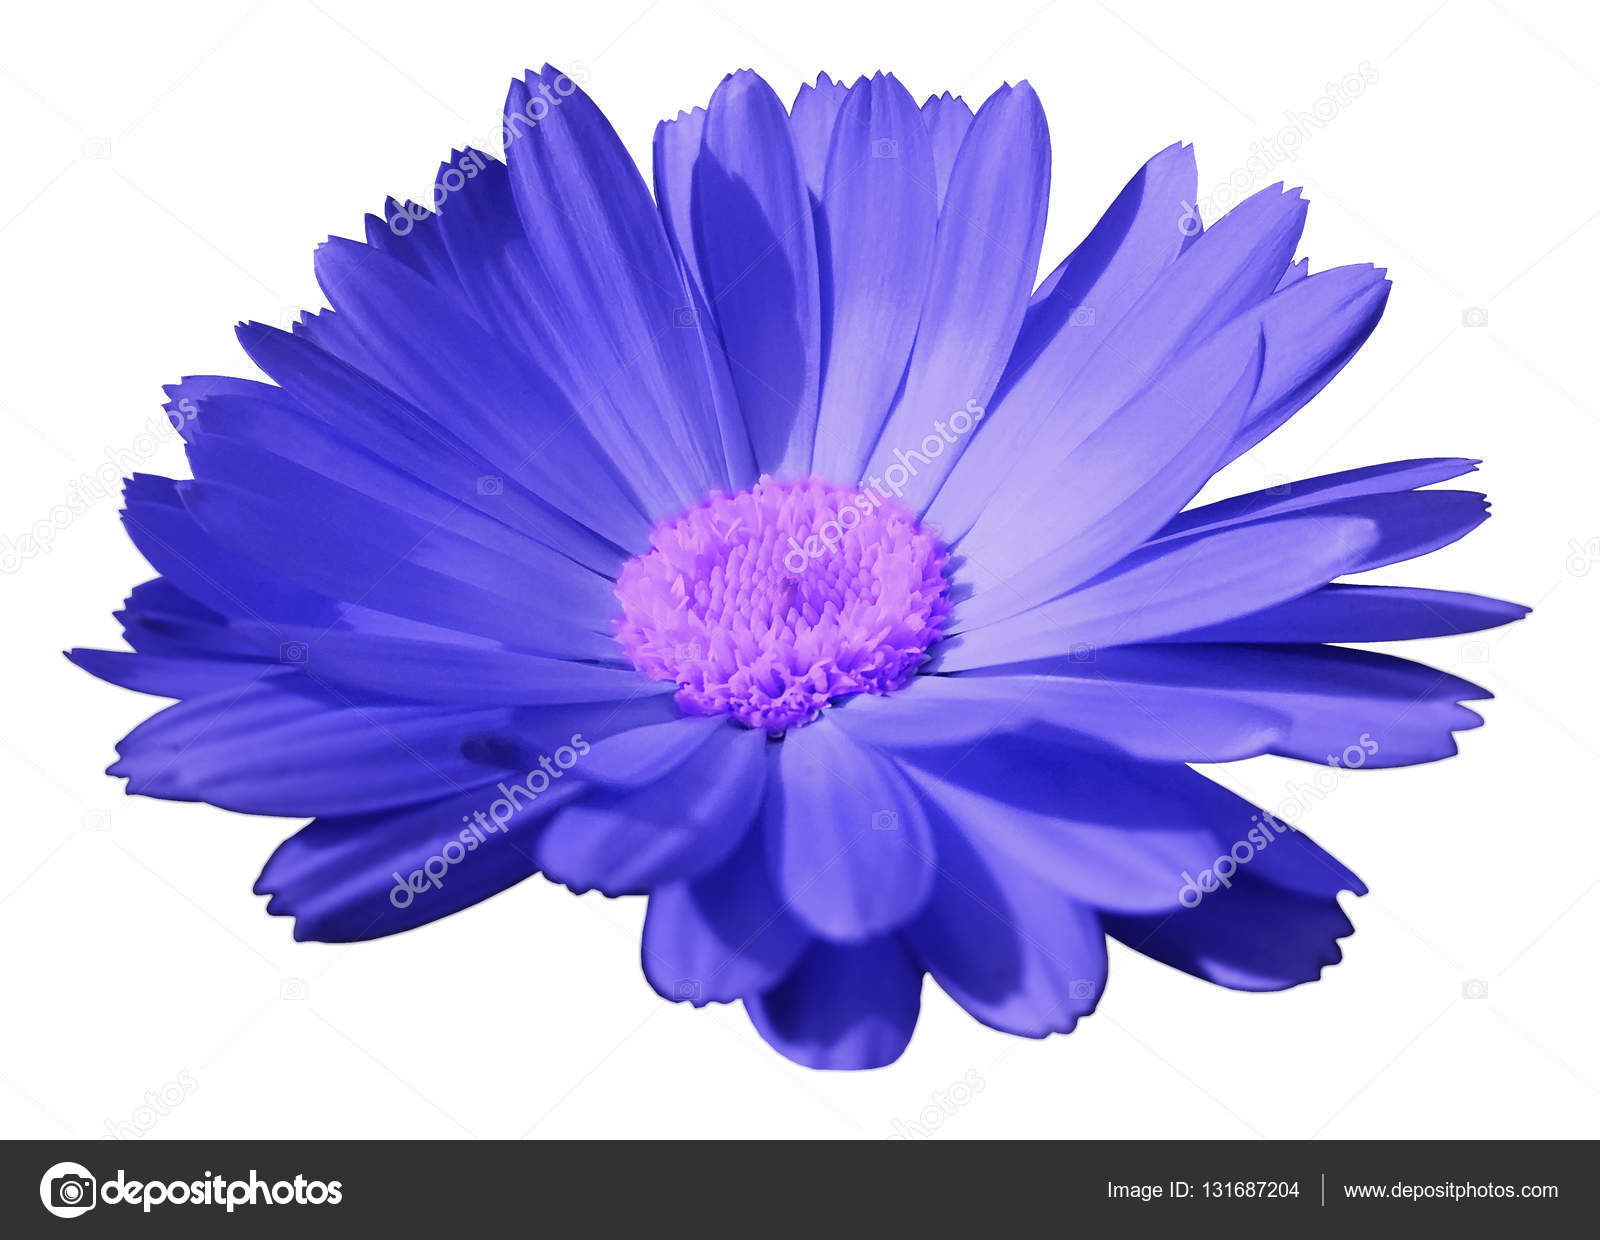 Blue flower calendula the white isolated background with clipping blue flower calendula the white isolated background with clipping path closeup no shadows light violet center nature mightylinksfo